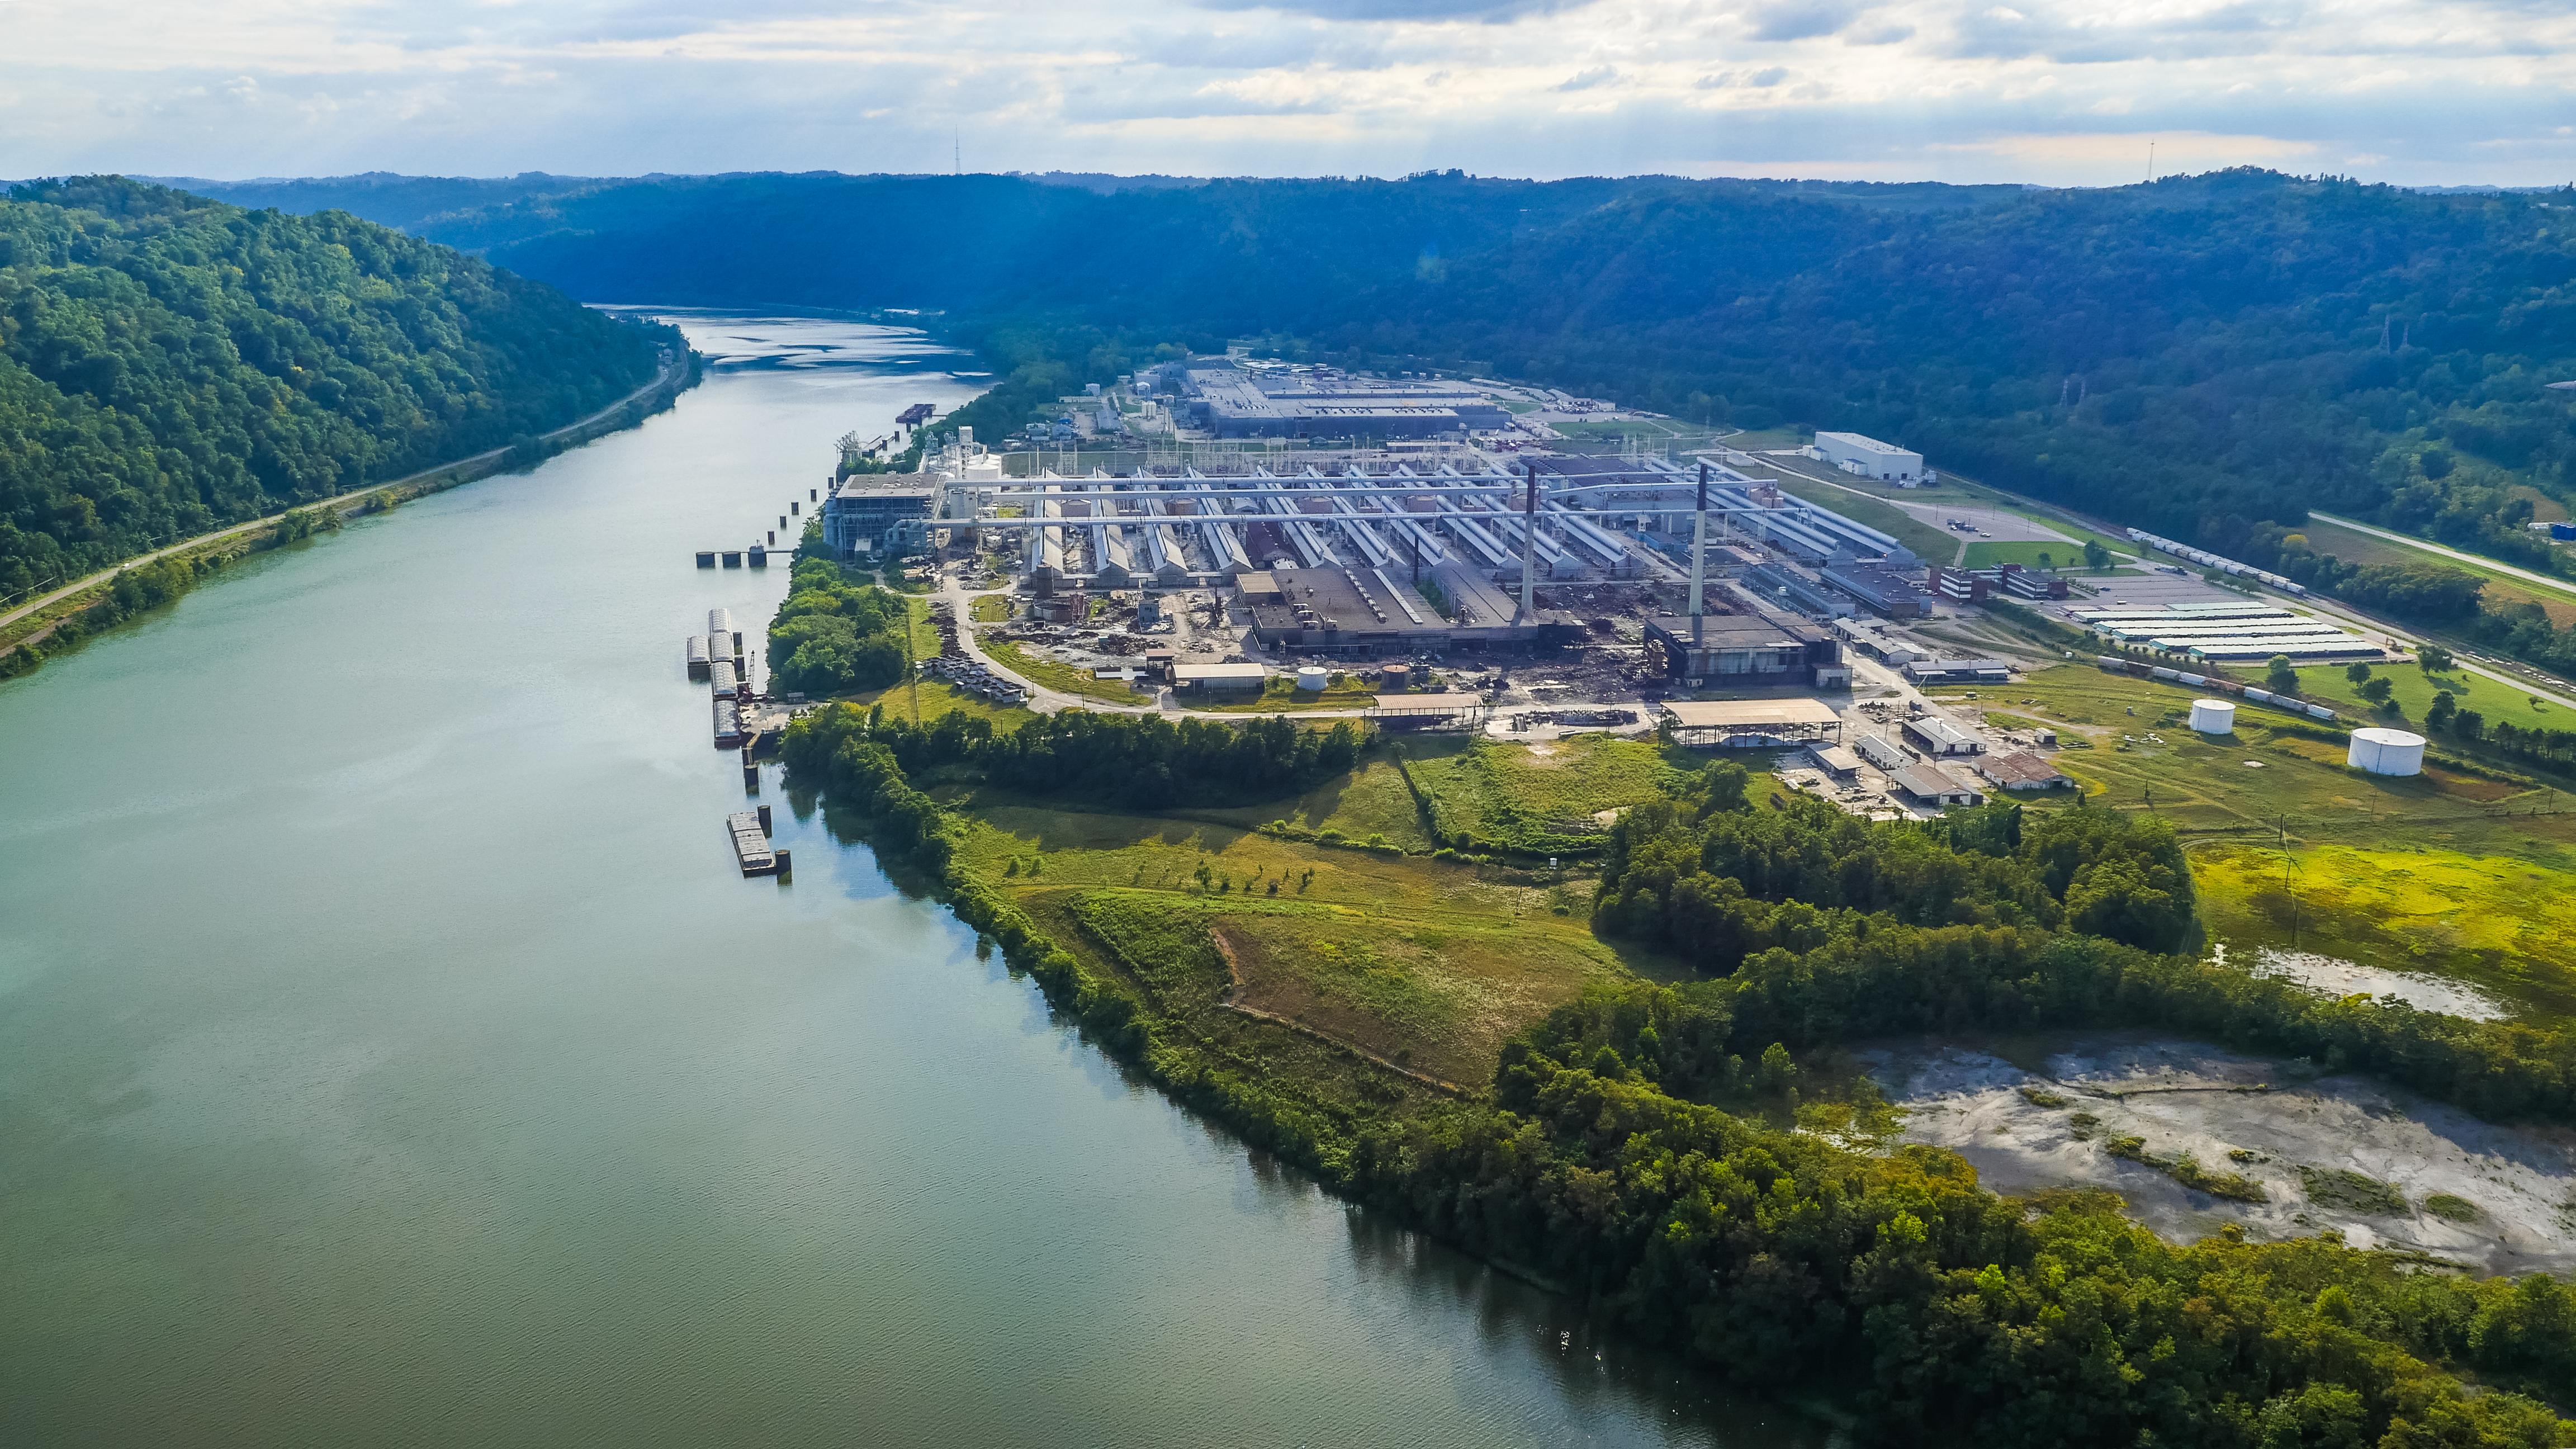 Aerial image of Long Ridge Energy Terminal